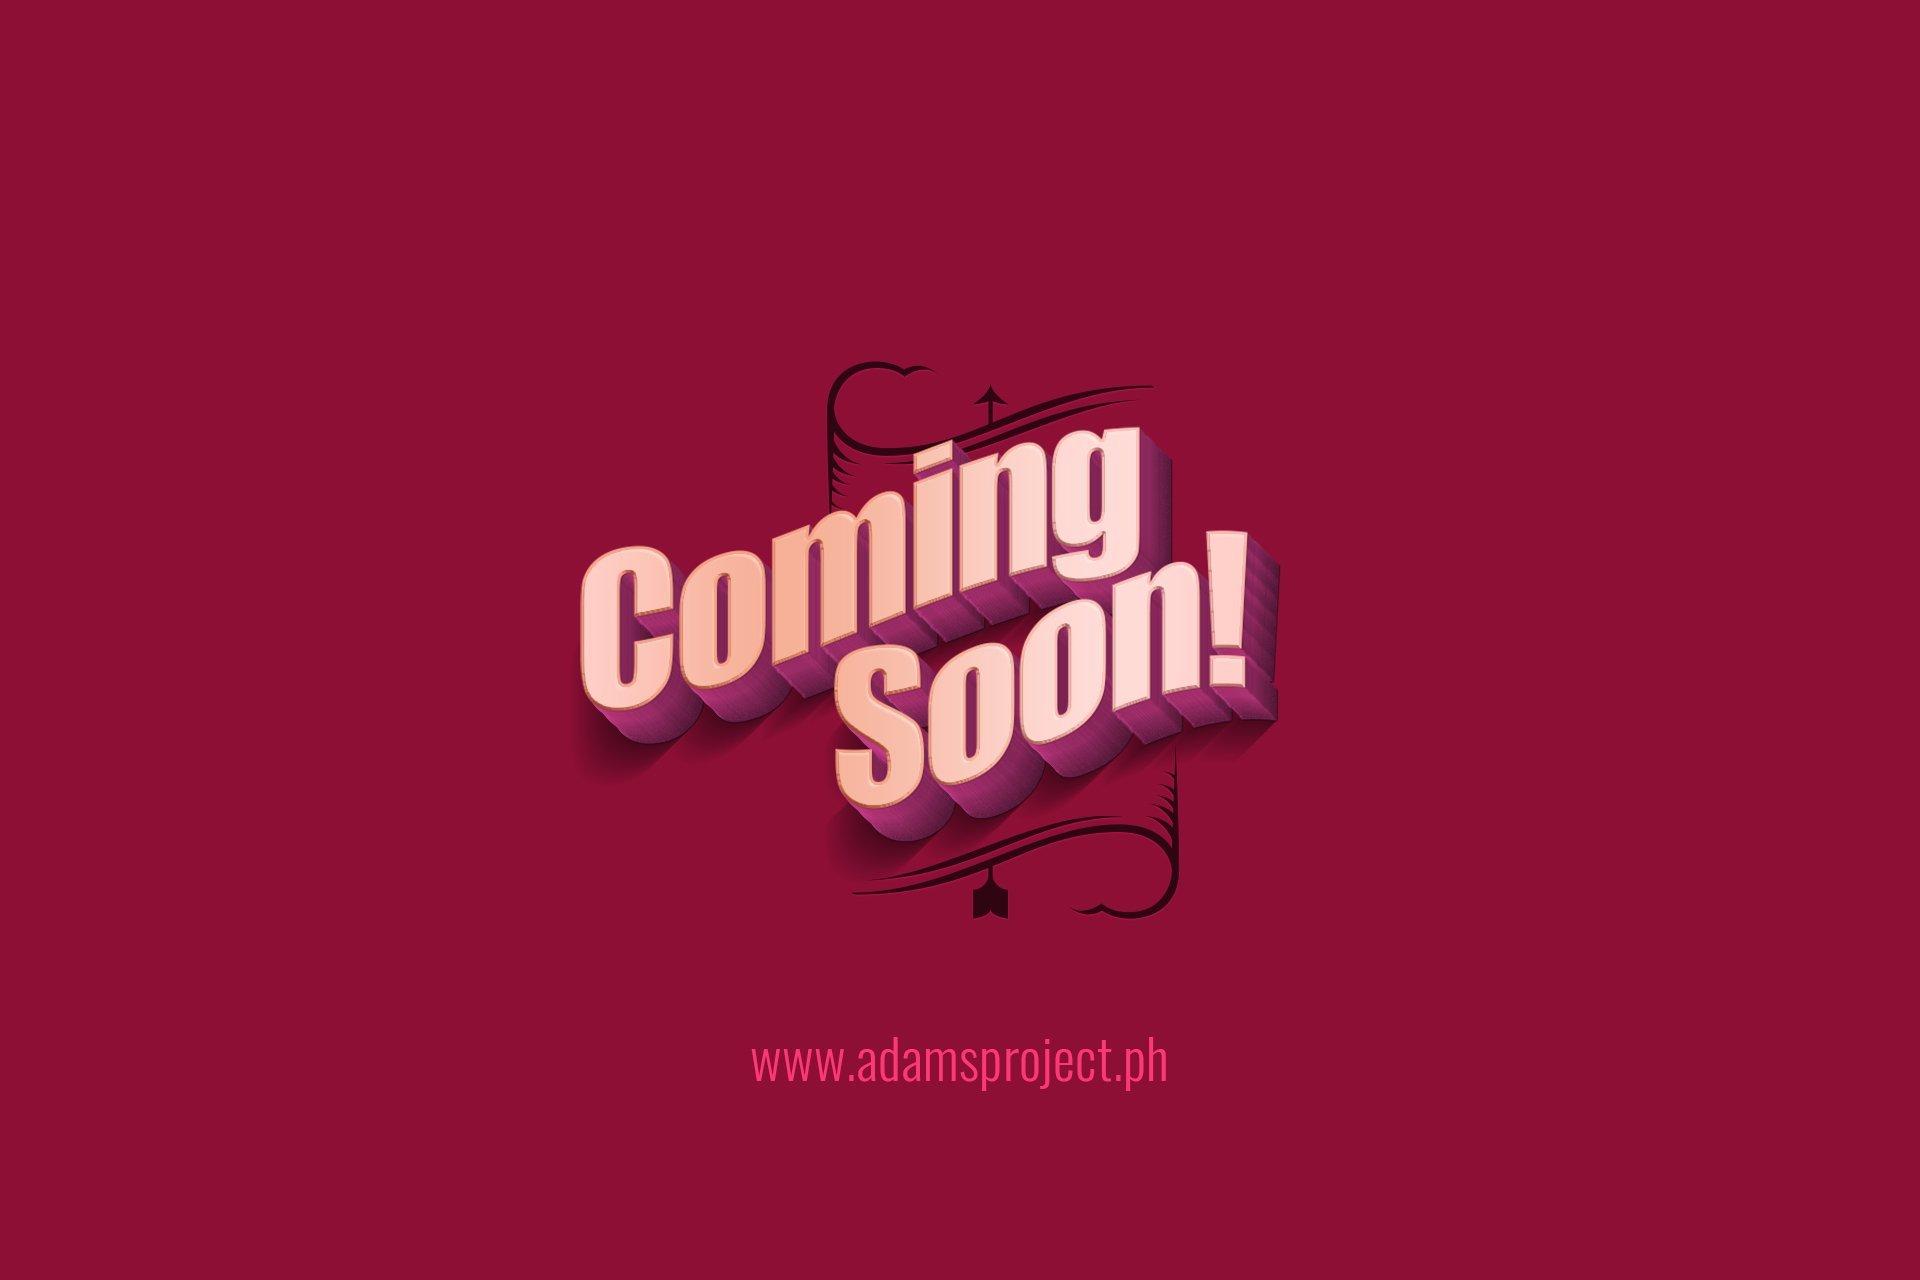 ADAMS_Project_Coming_Soon